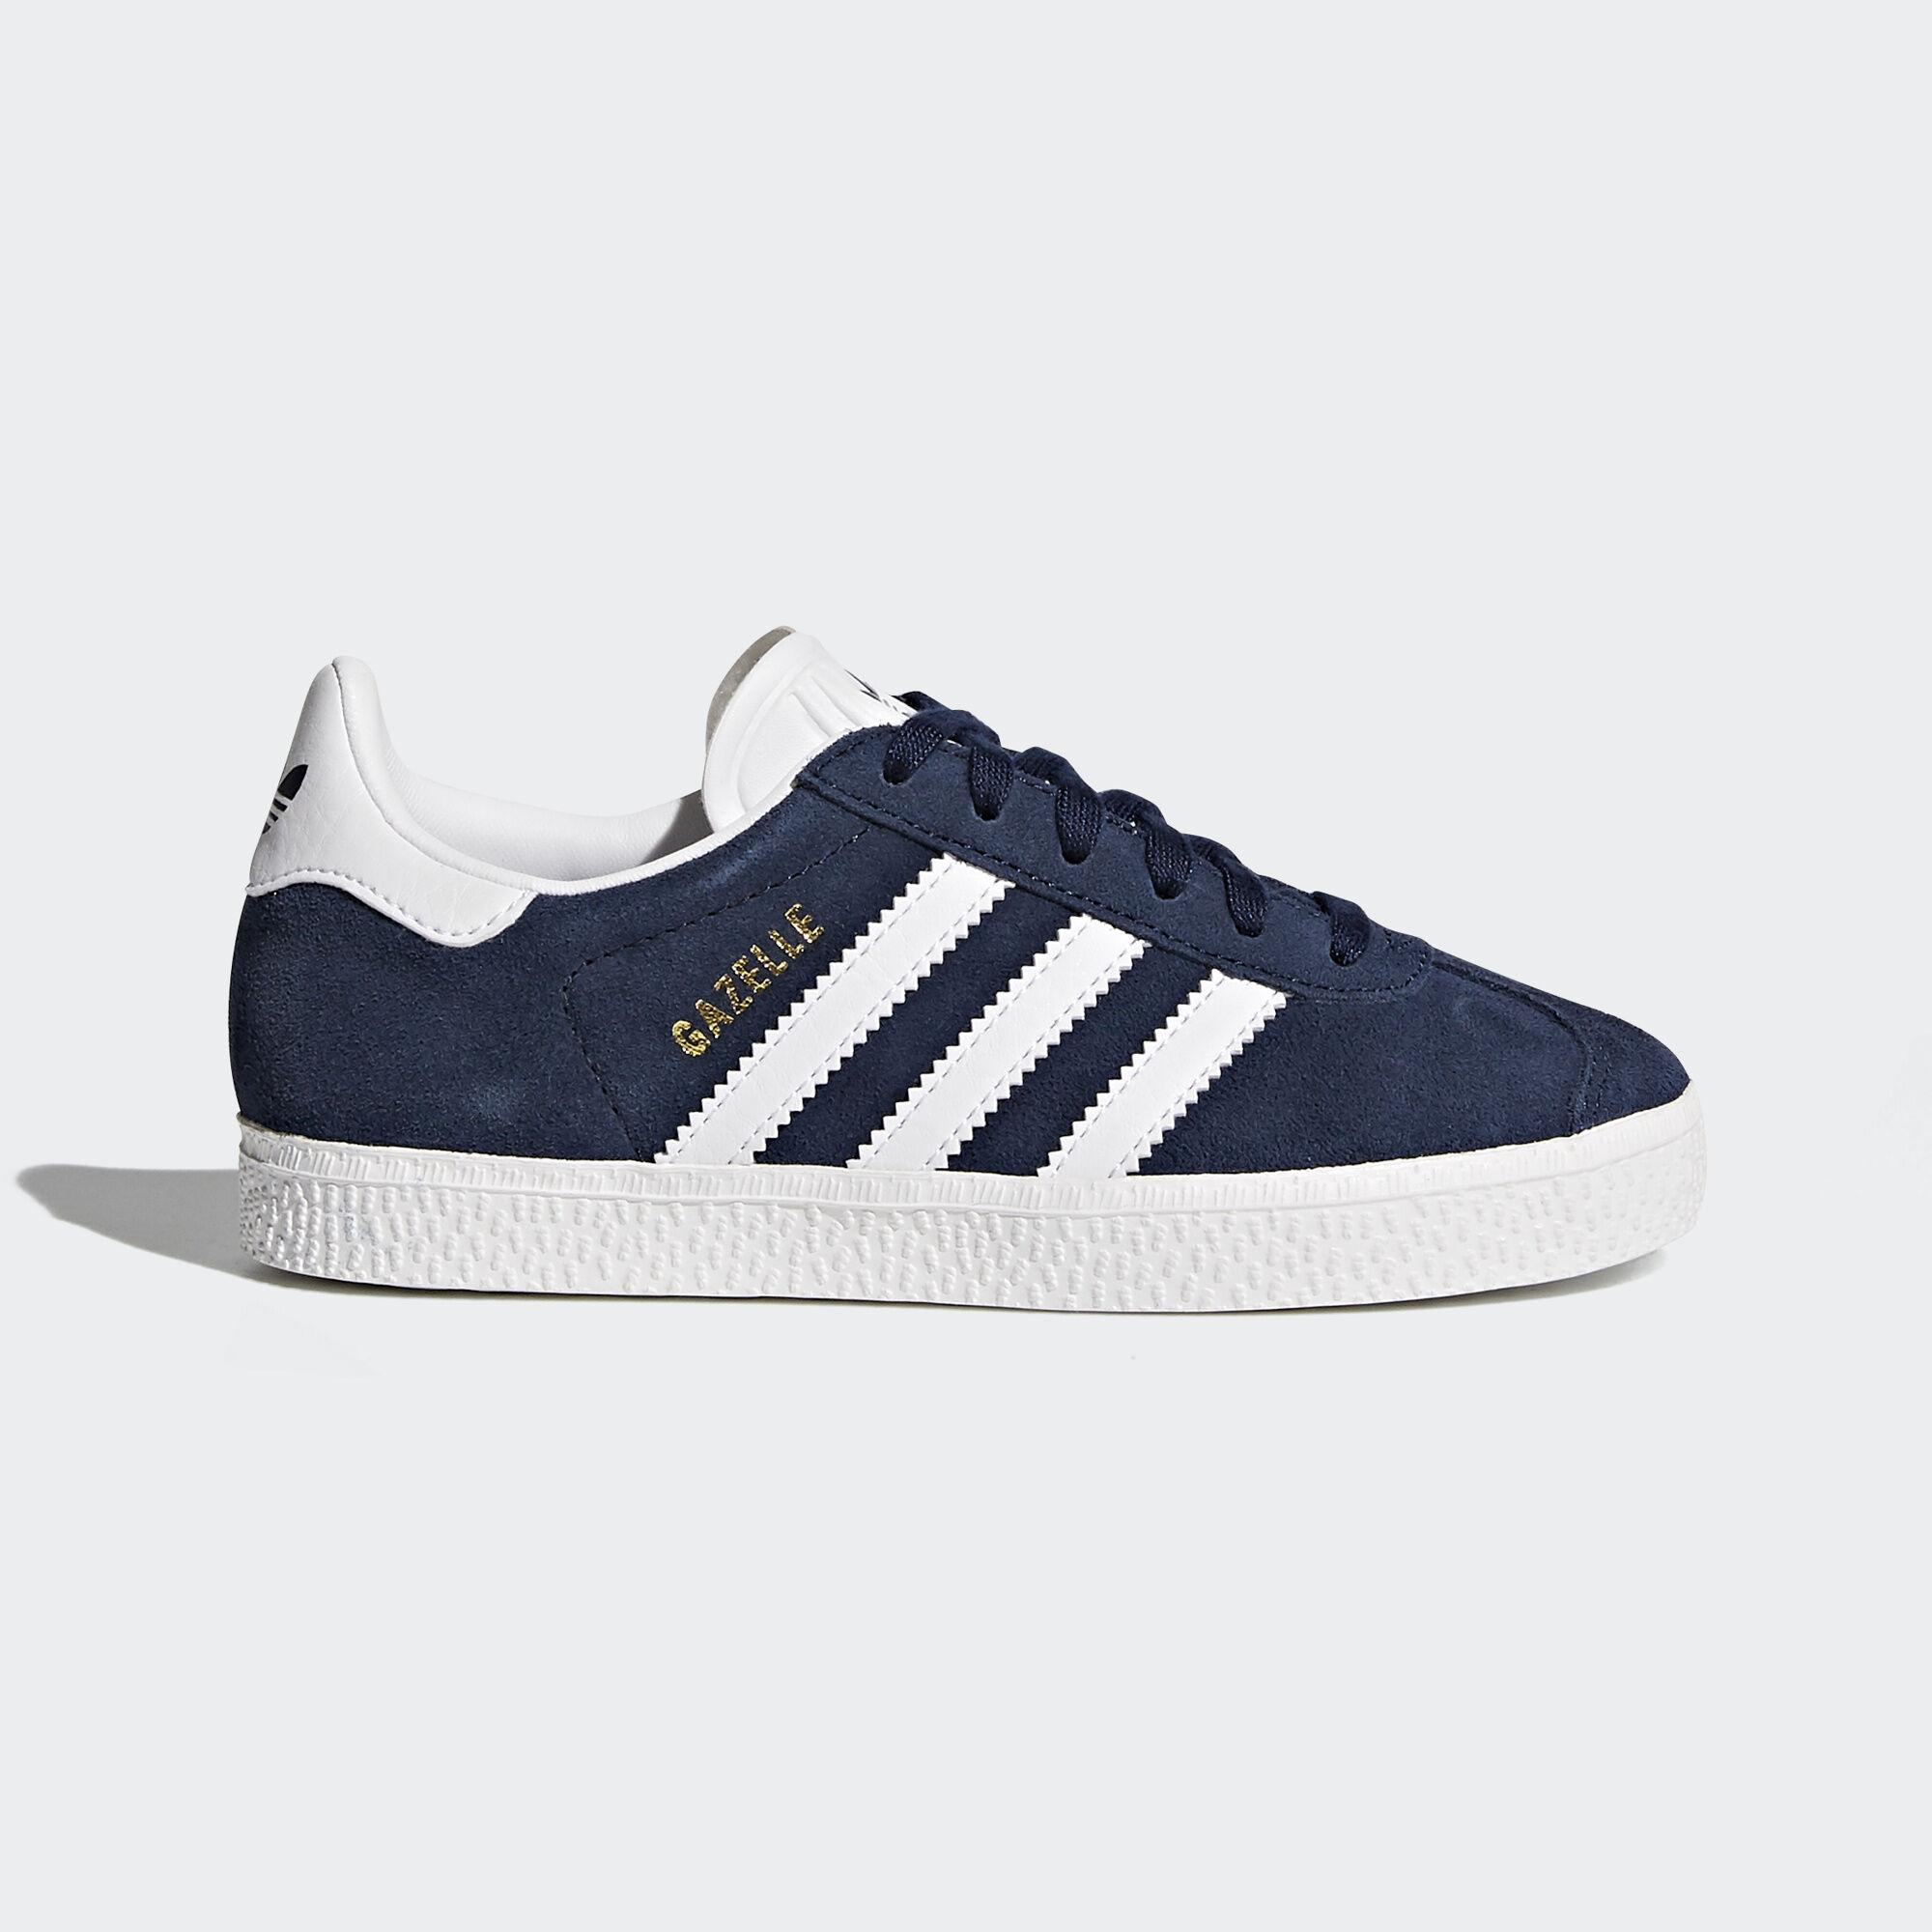 Adidas schoenen Adidas Gazelle Gazelle Turkije Turkije blauw Adidas Gazelle blauw schoenen 44Zq7wR1